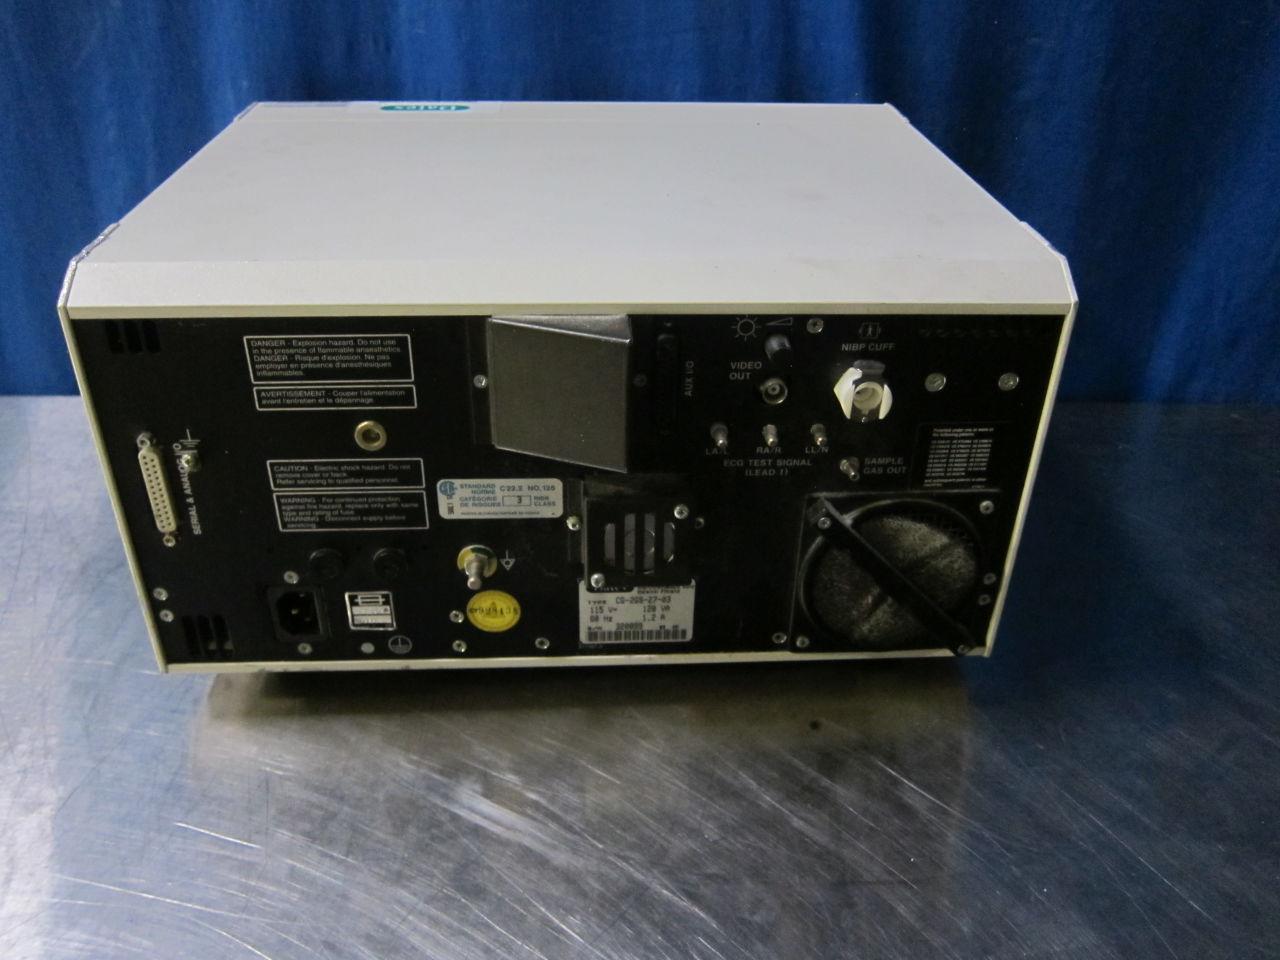 DATEX Cardiocap II Monitor